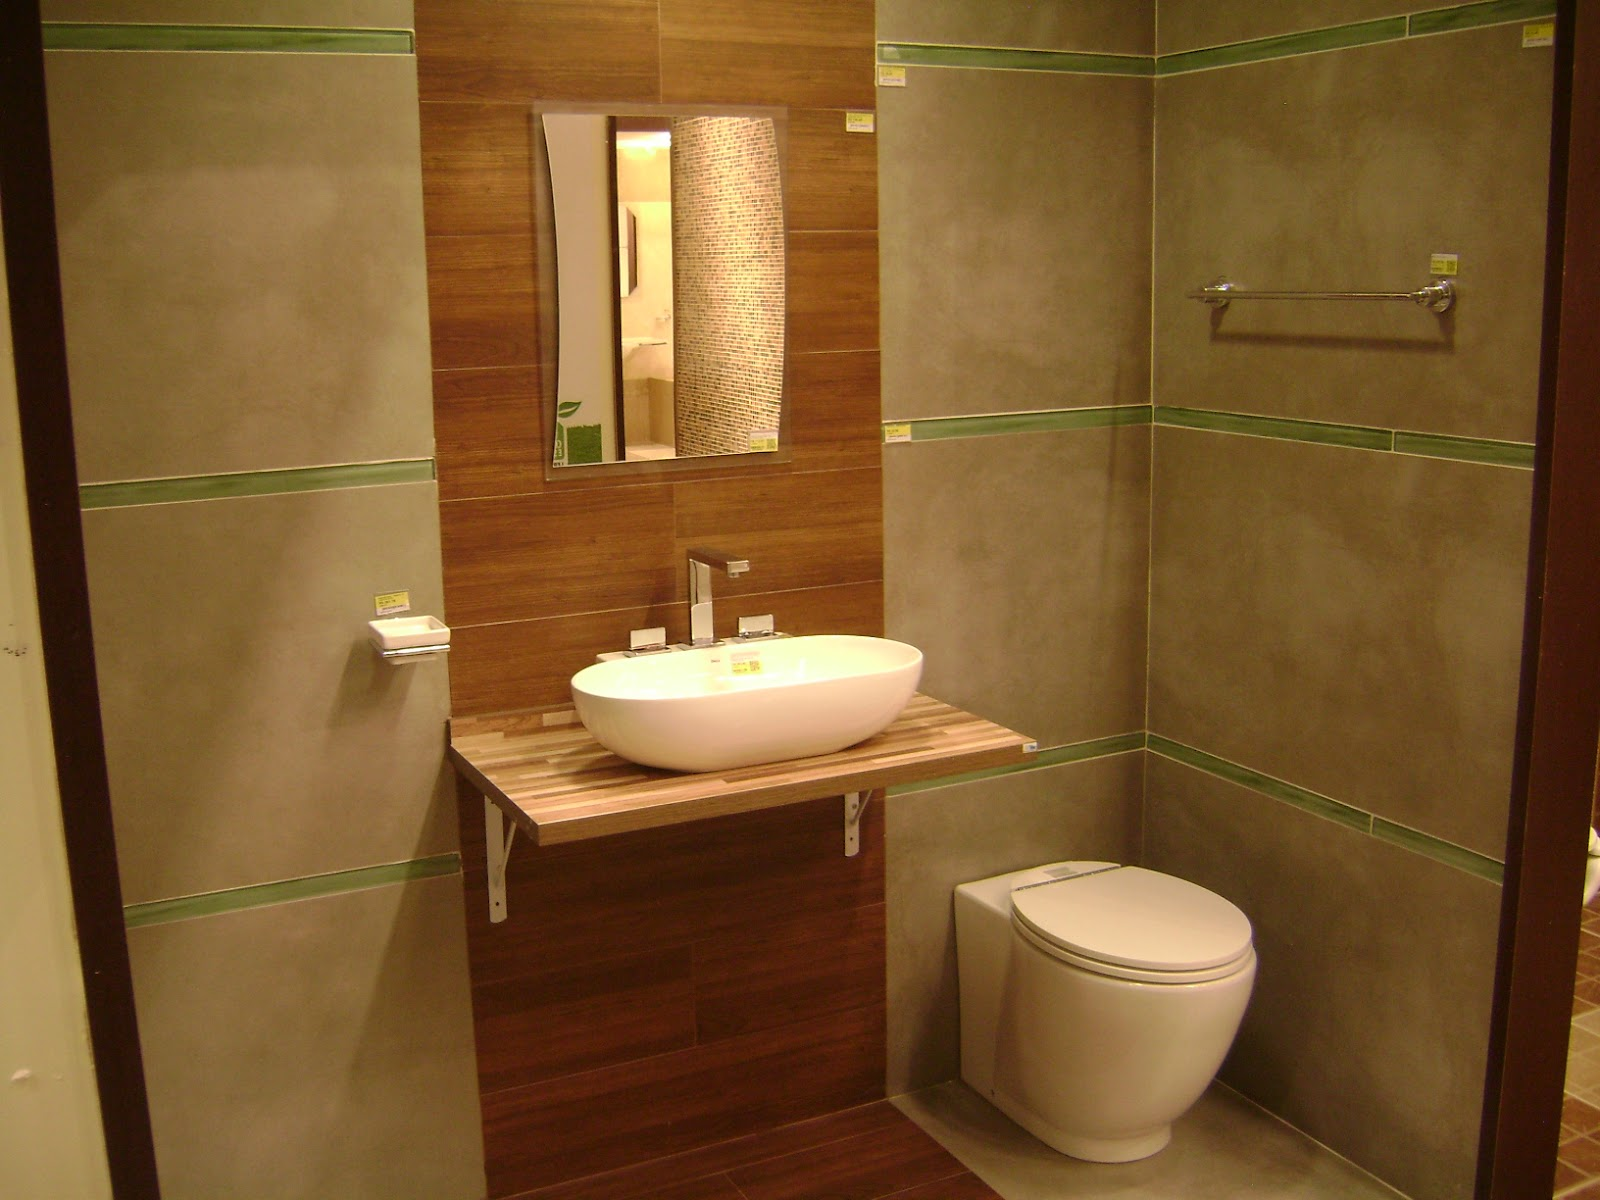 Richard hilario arquitetura projetos ambientes show room for Tappeti sala leroy merlin